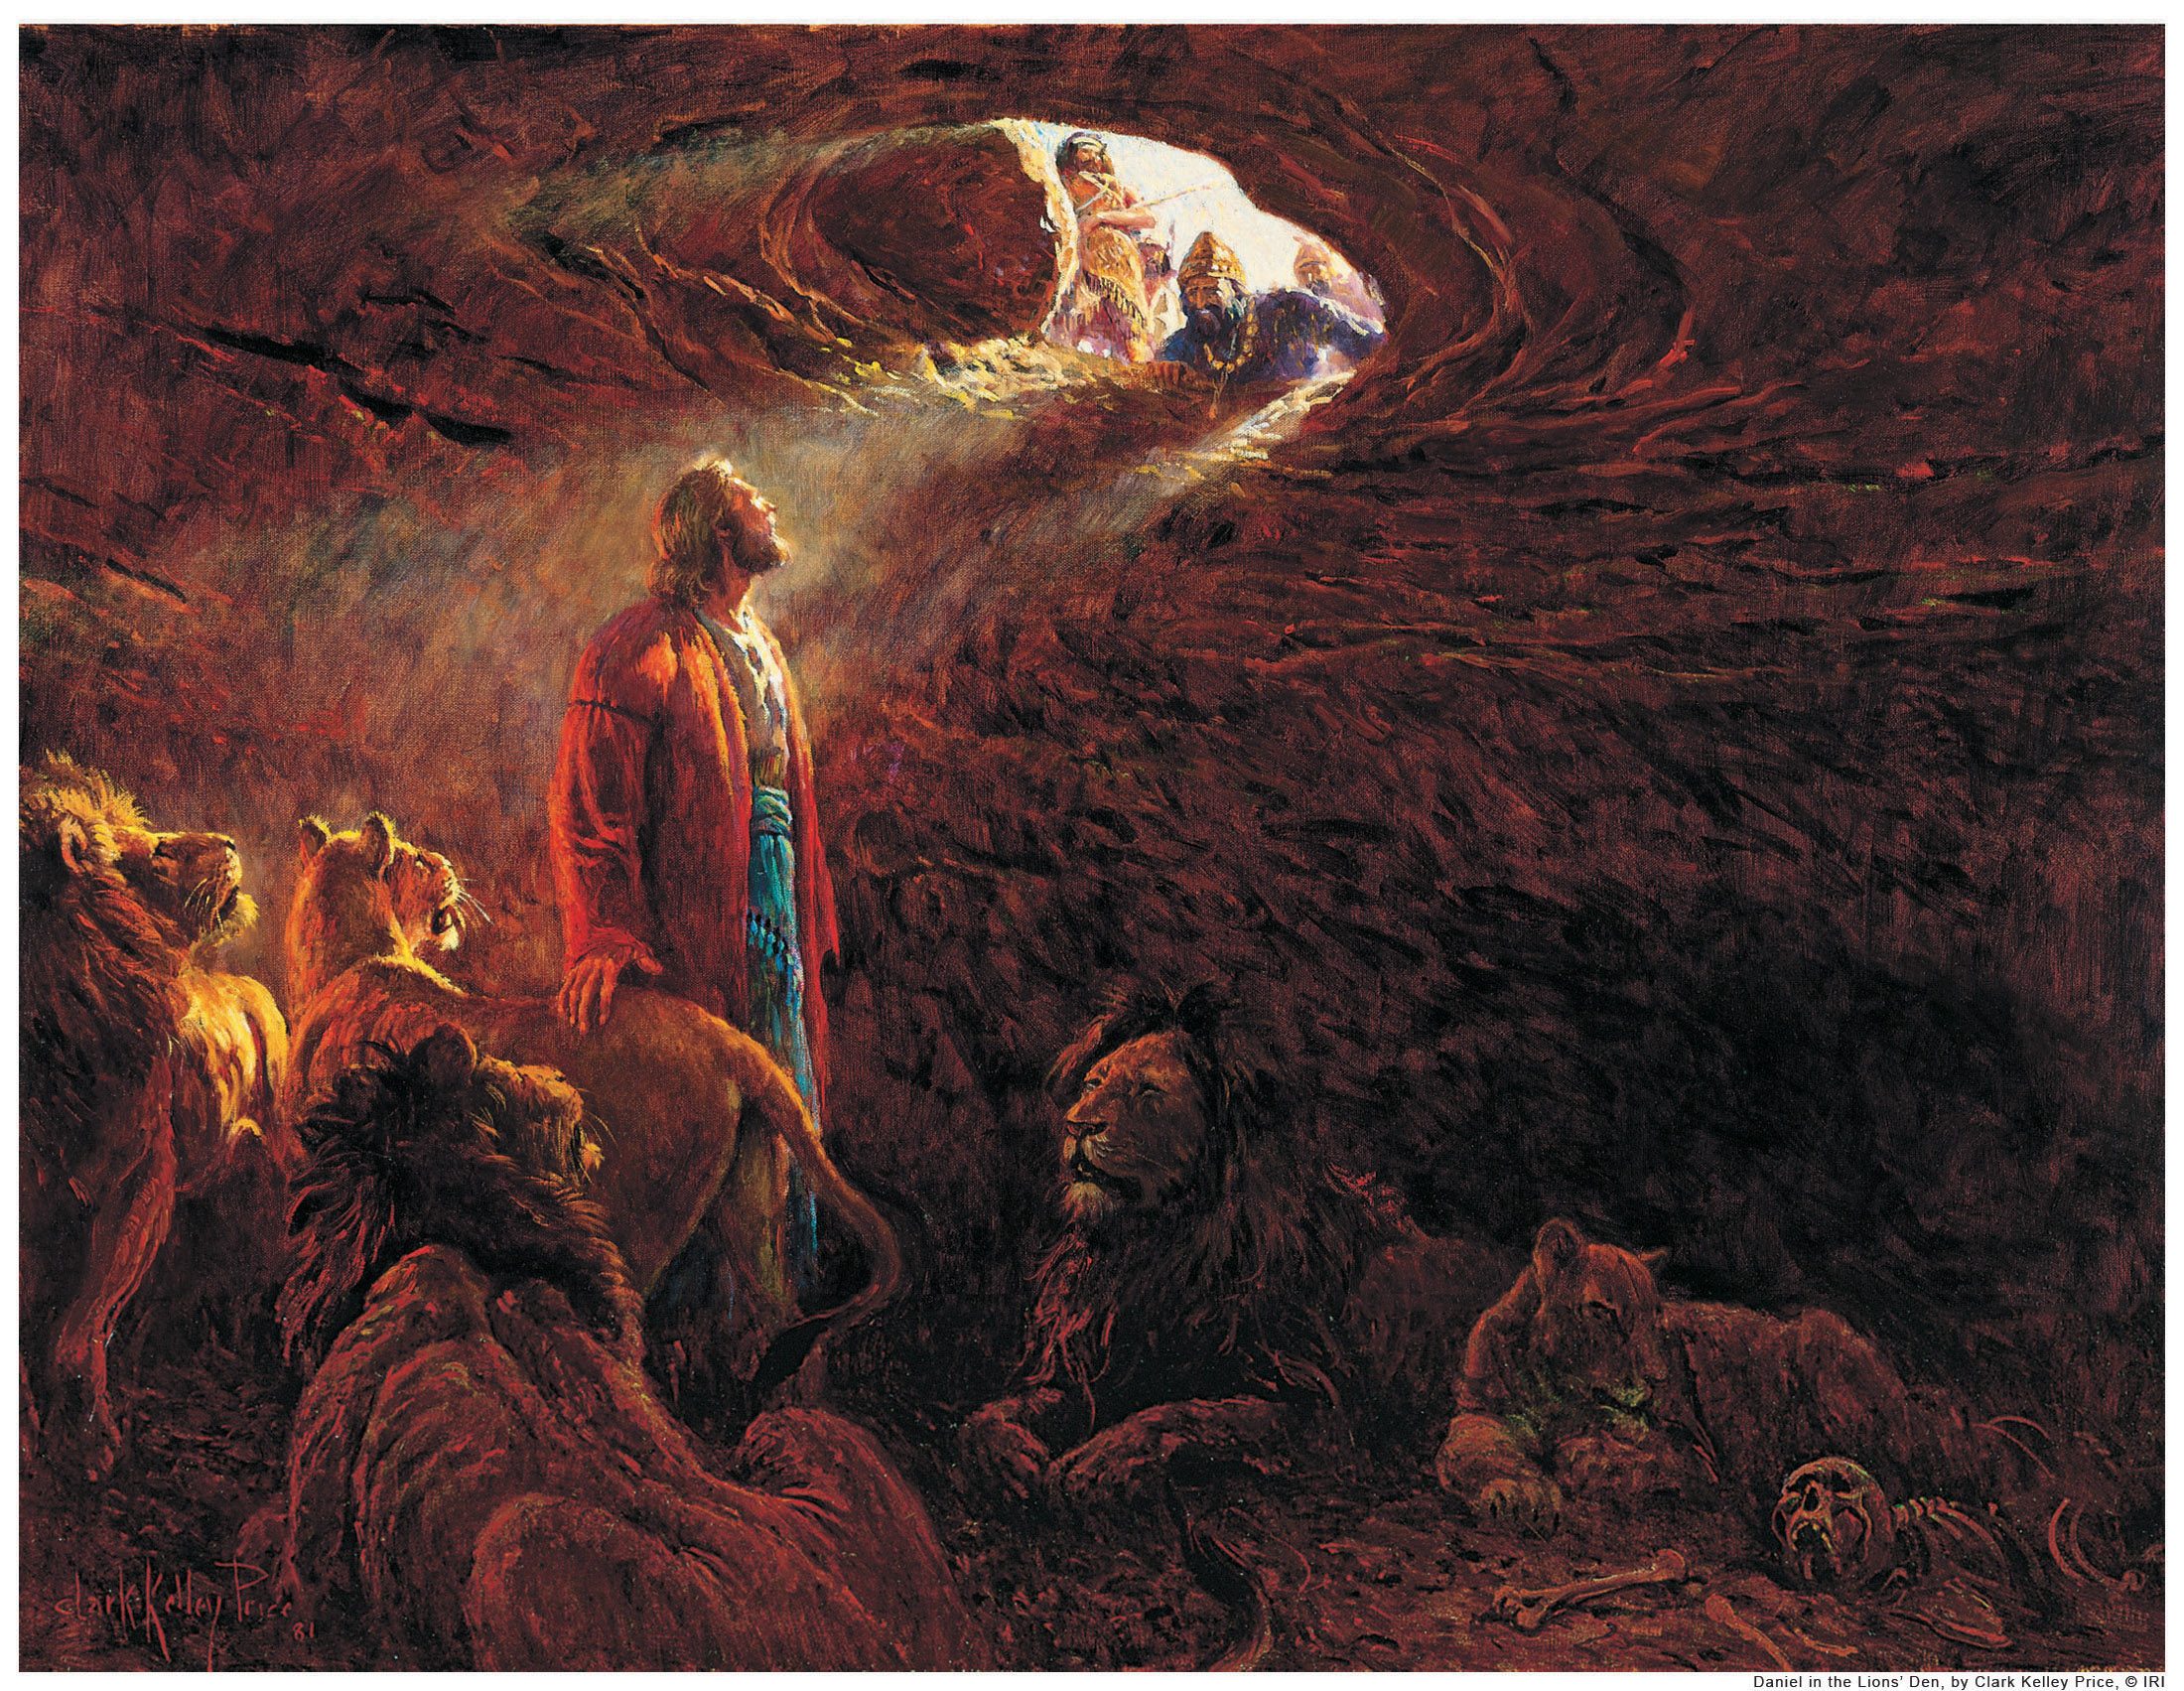 Daniel Shepherd Of Lions